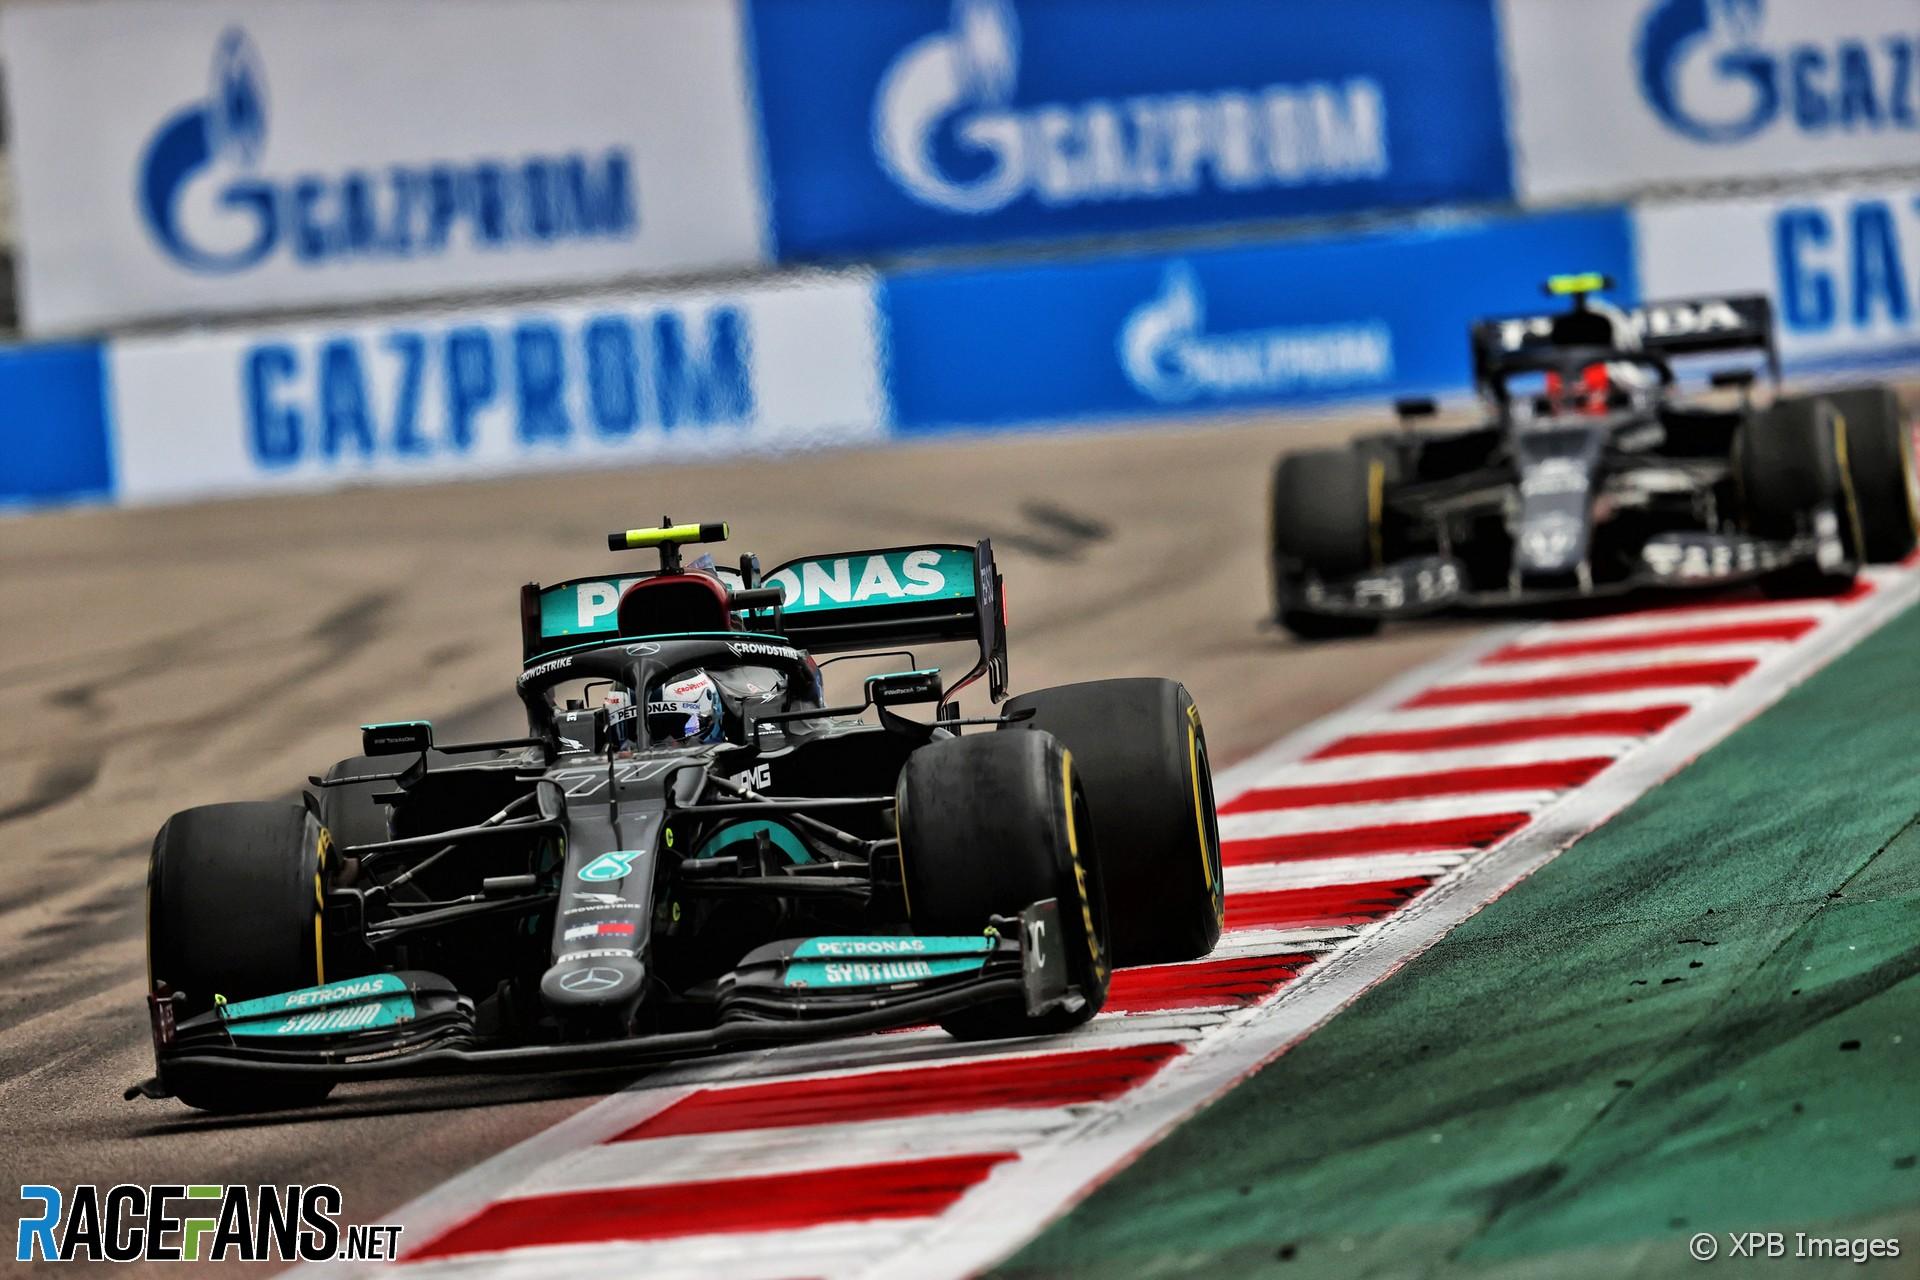 Valtteri Bottas, Mercedes, Sochi Autodrom, 2021